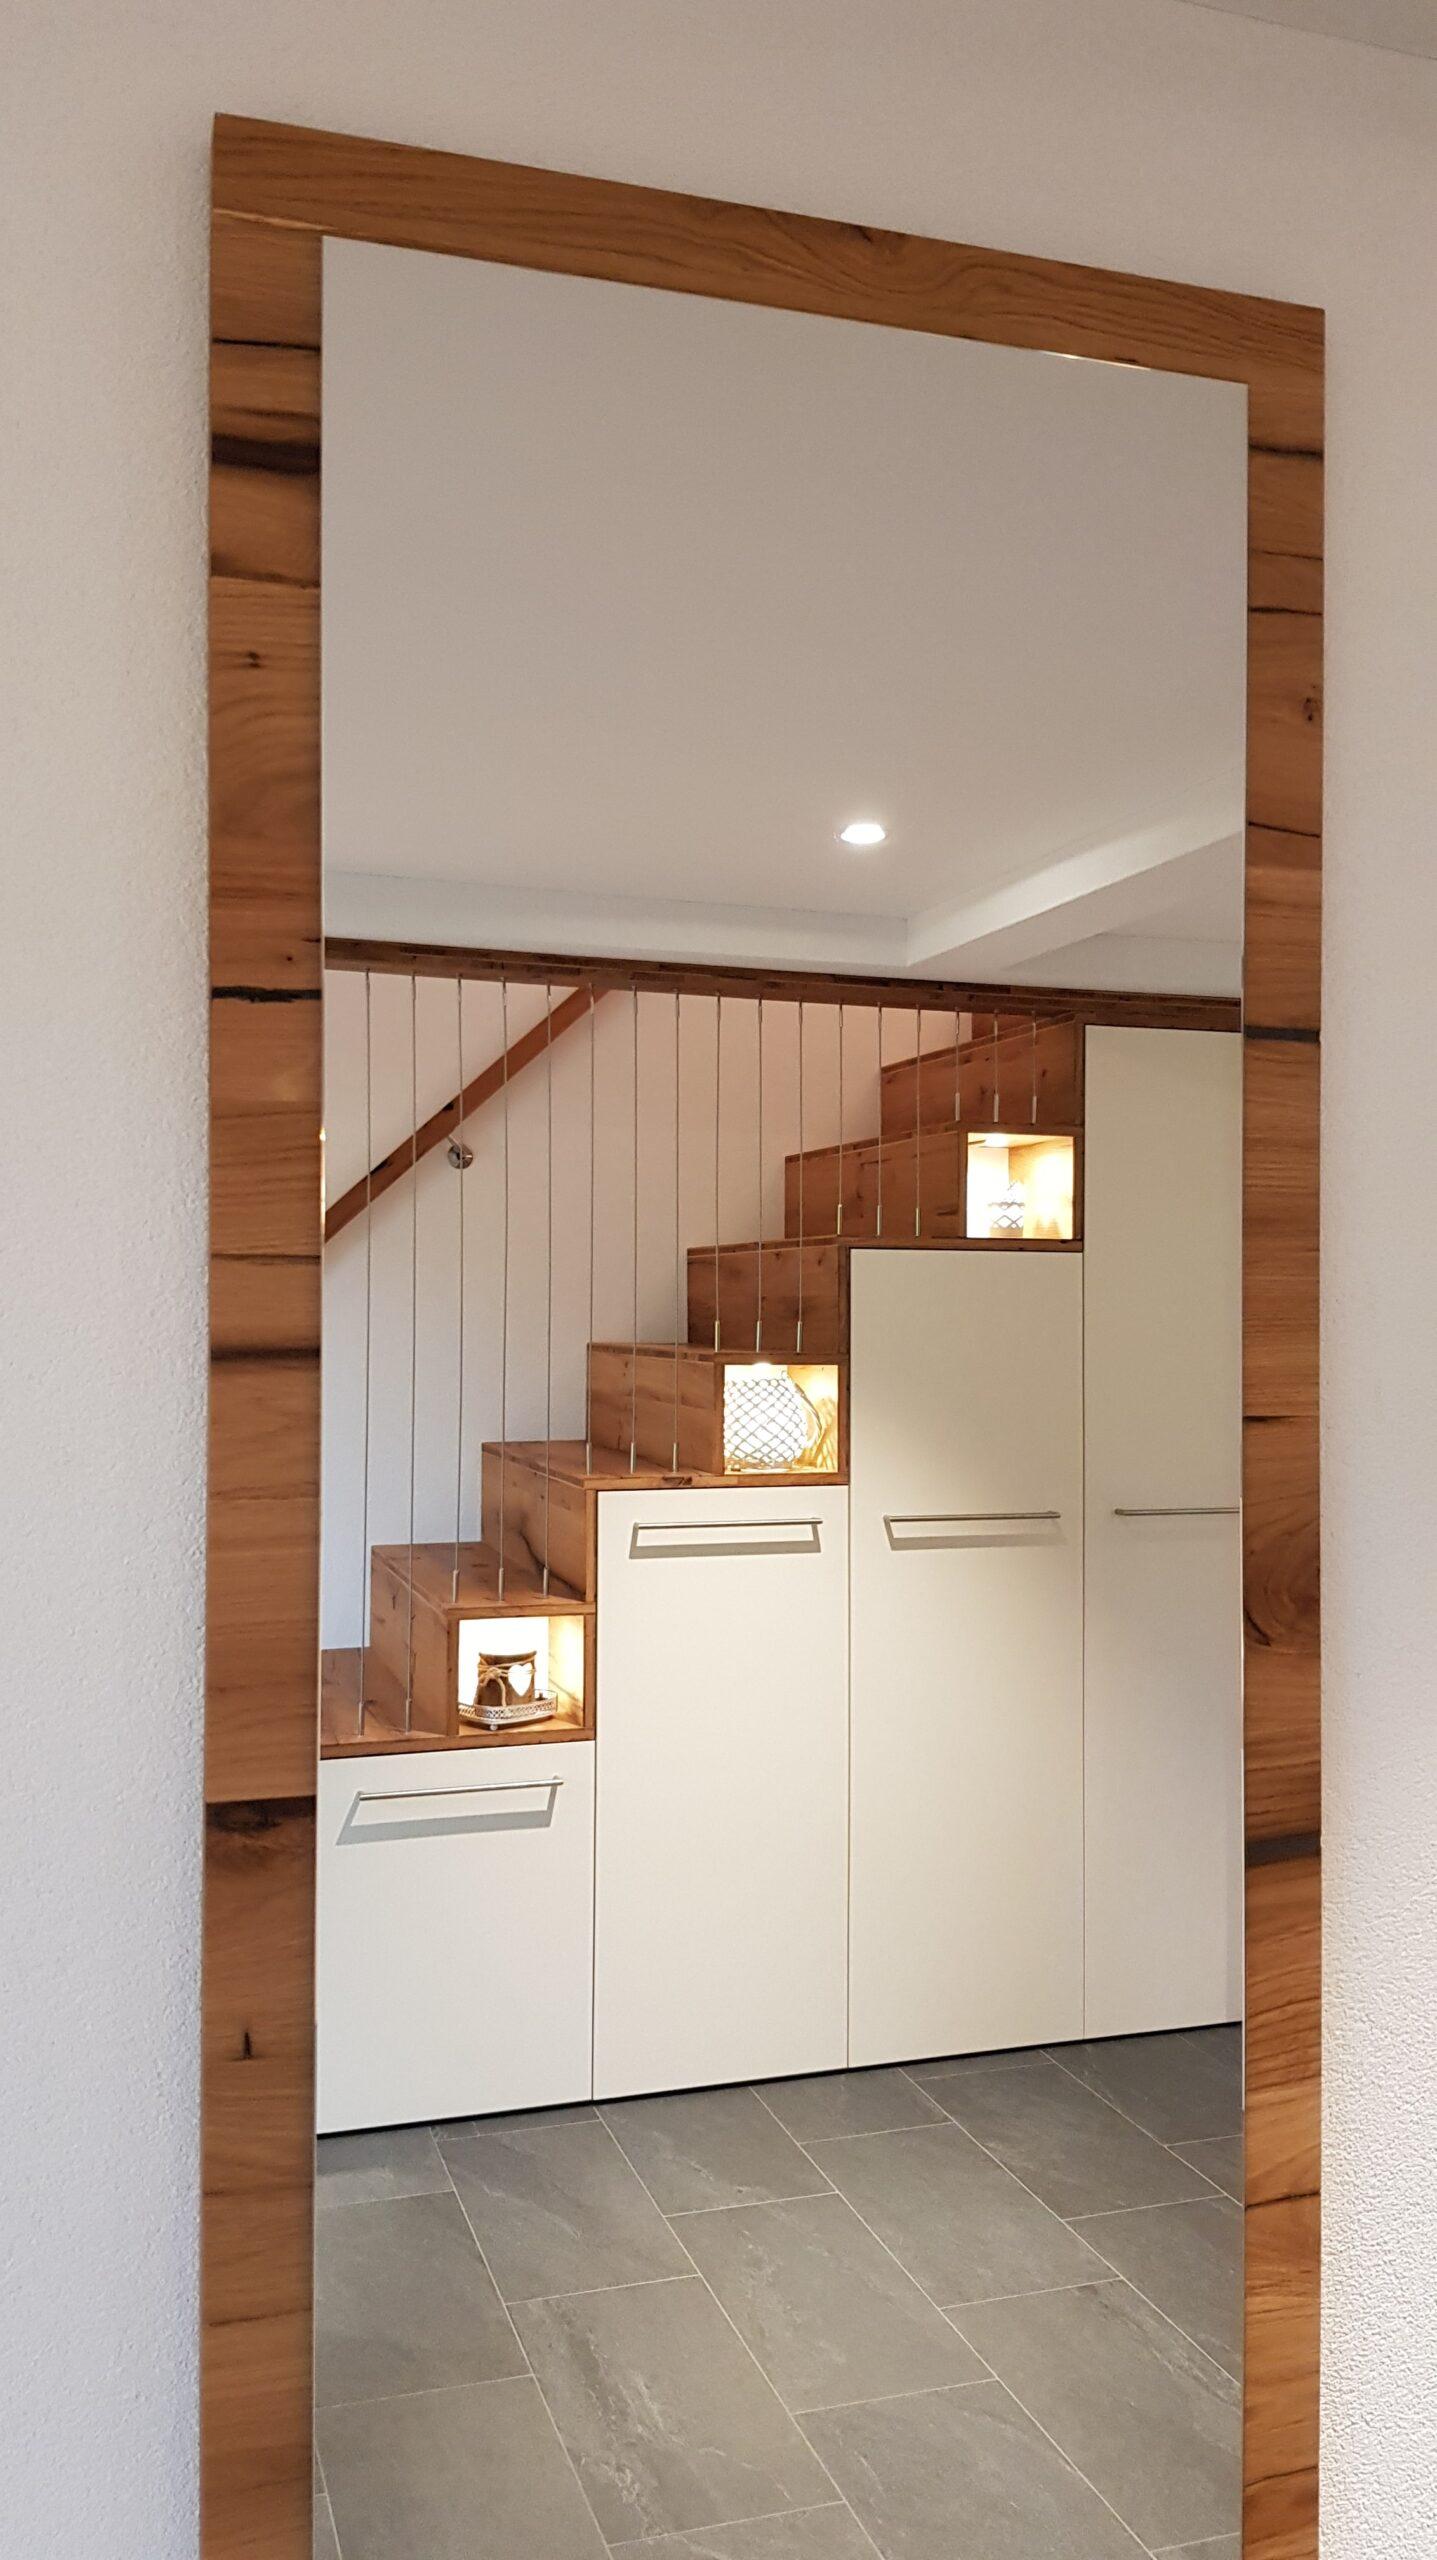 Wooddesign_Treppen_Teppengeländer_Holztreppen_Treppenverkleidung_Treppenmöbel (7)-min